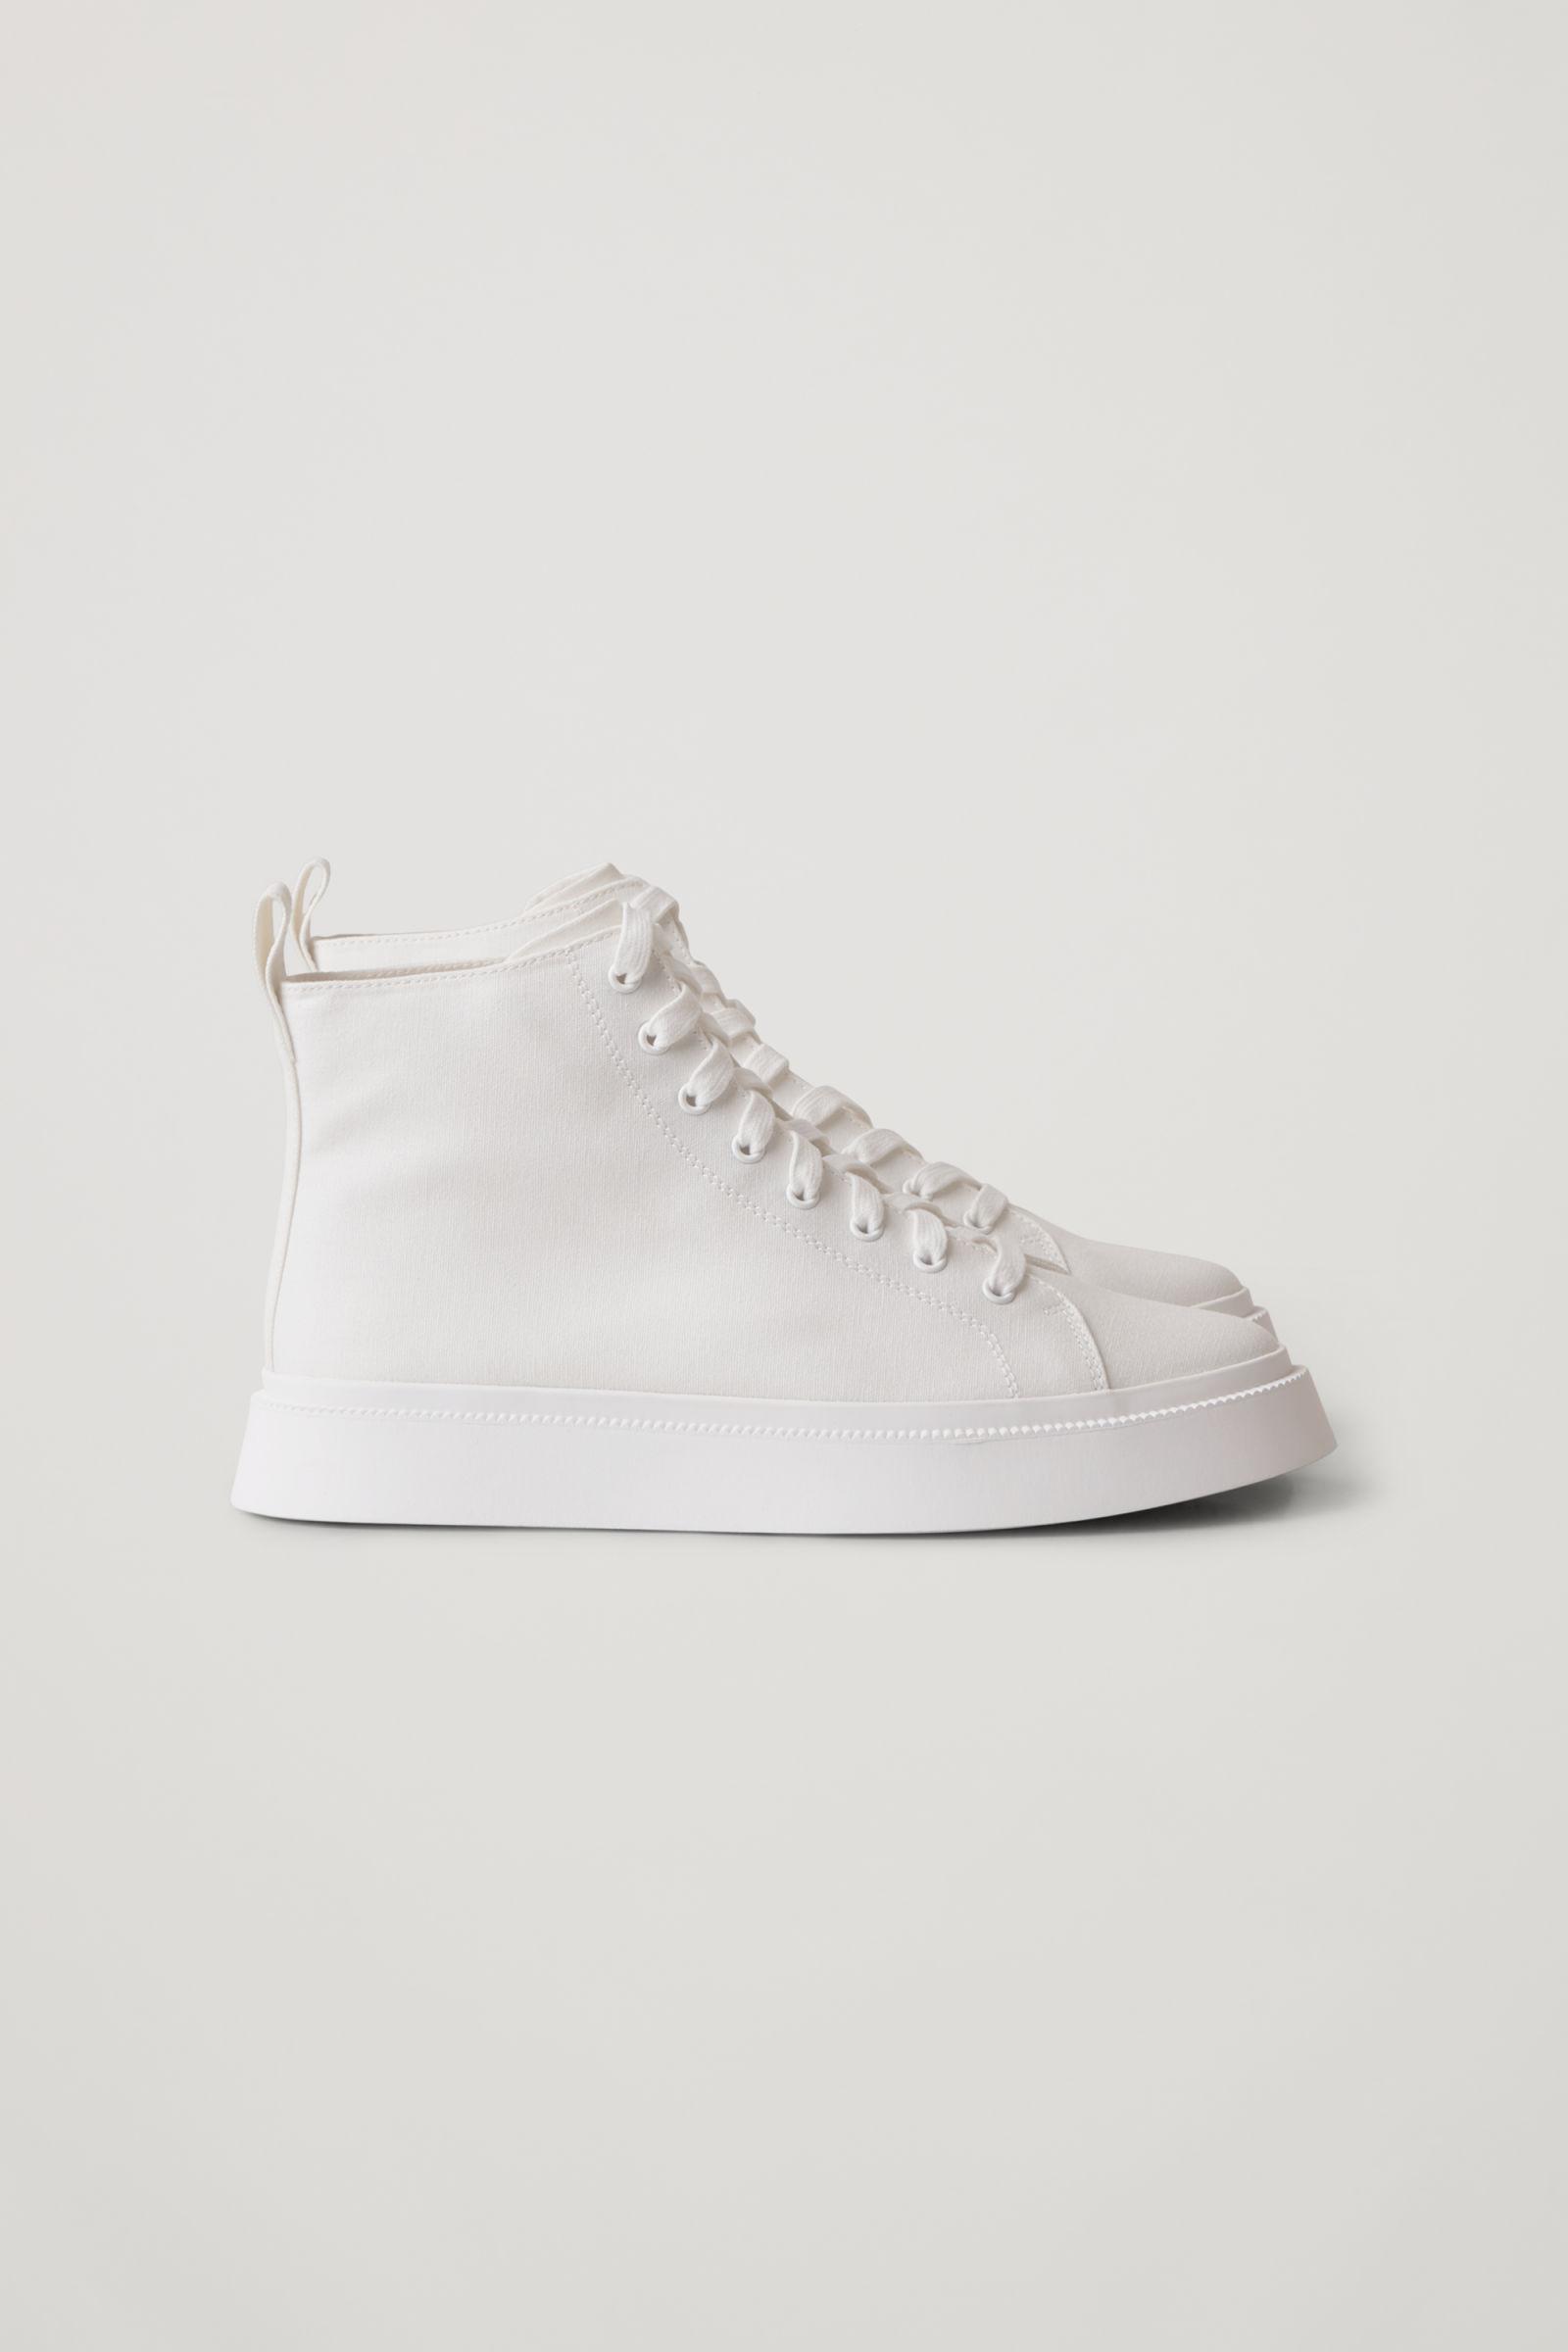 4. kép: COS sneaker